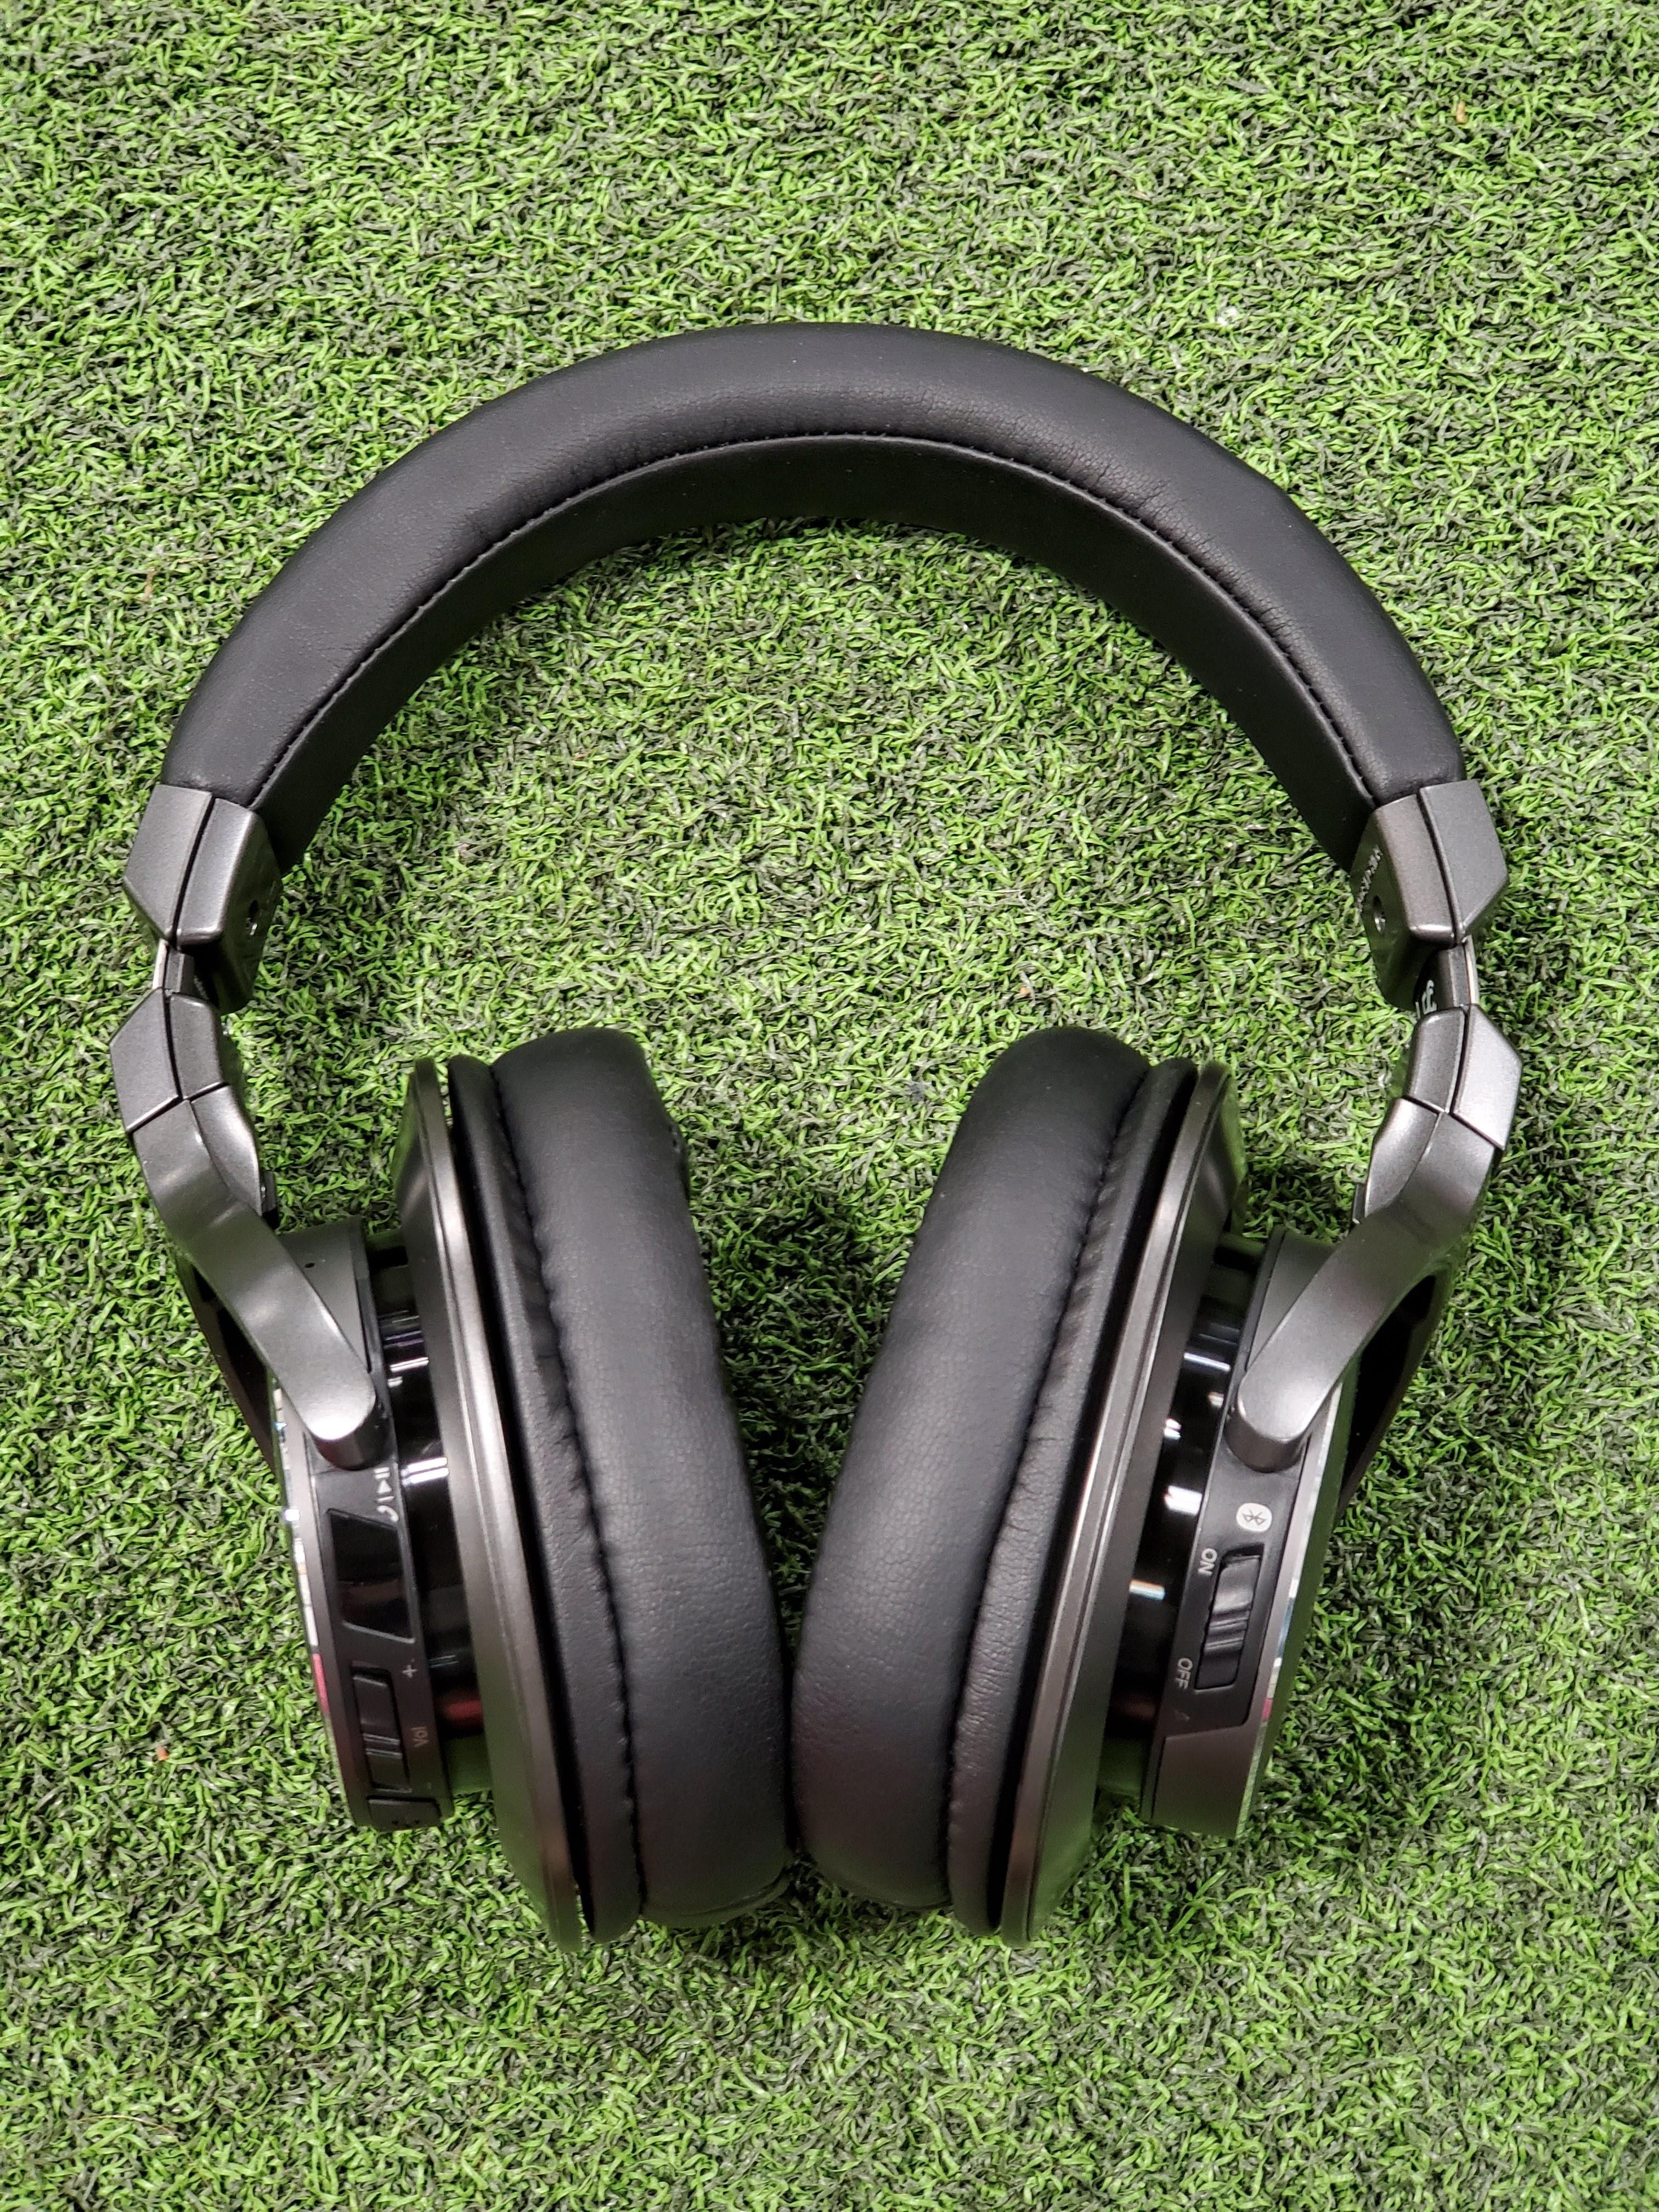 Audio-Technica ATH-DSR7BT Bluetooth headphones front view